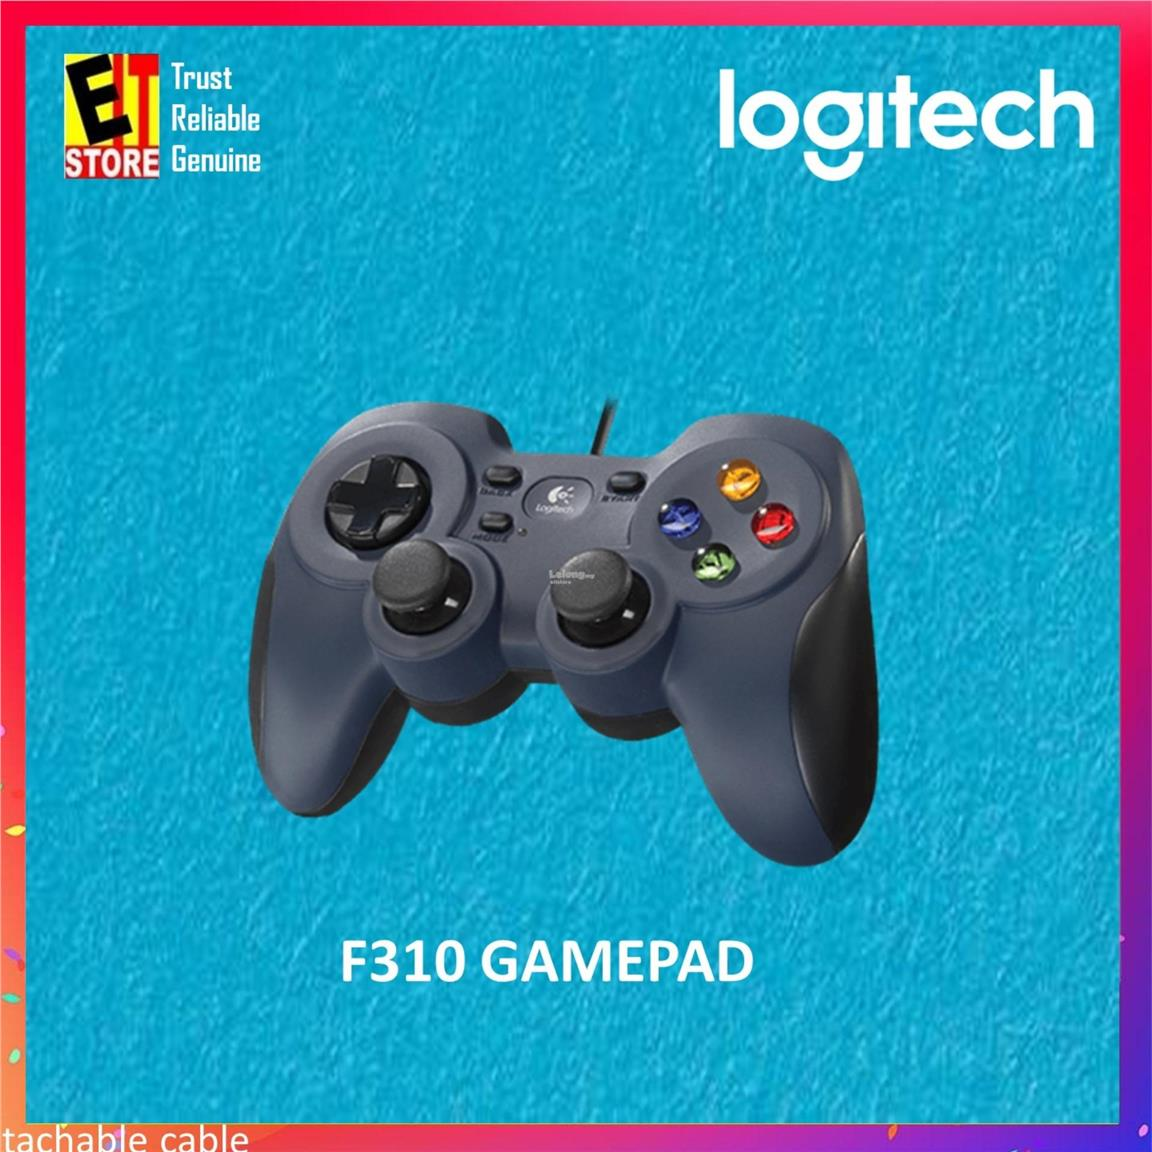 LOGITECH F310 WIRED USB GAMEPAD CONTROLLER